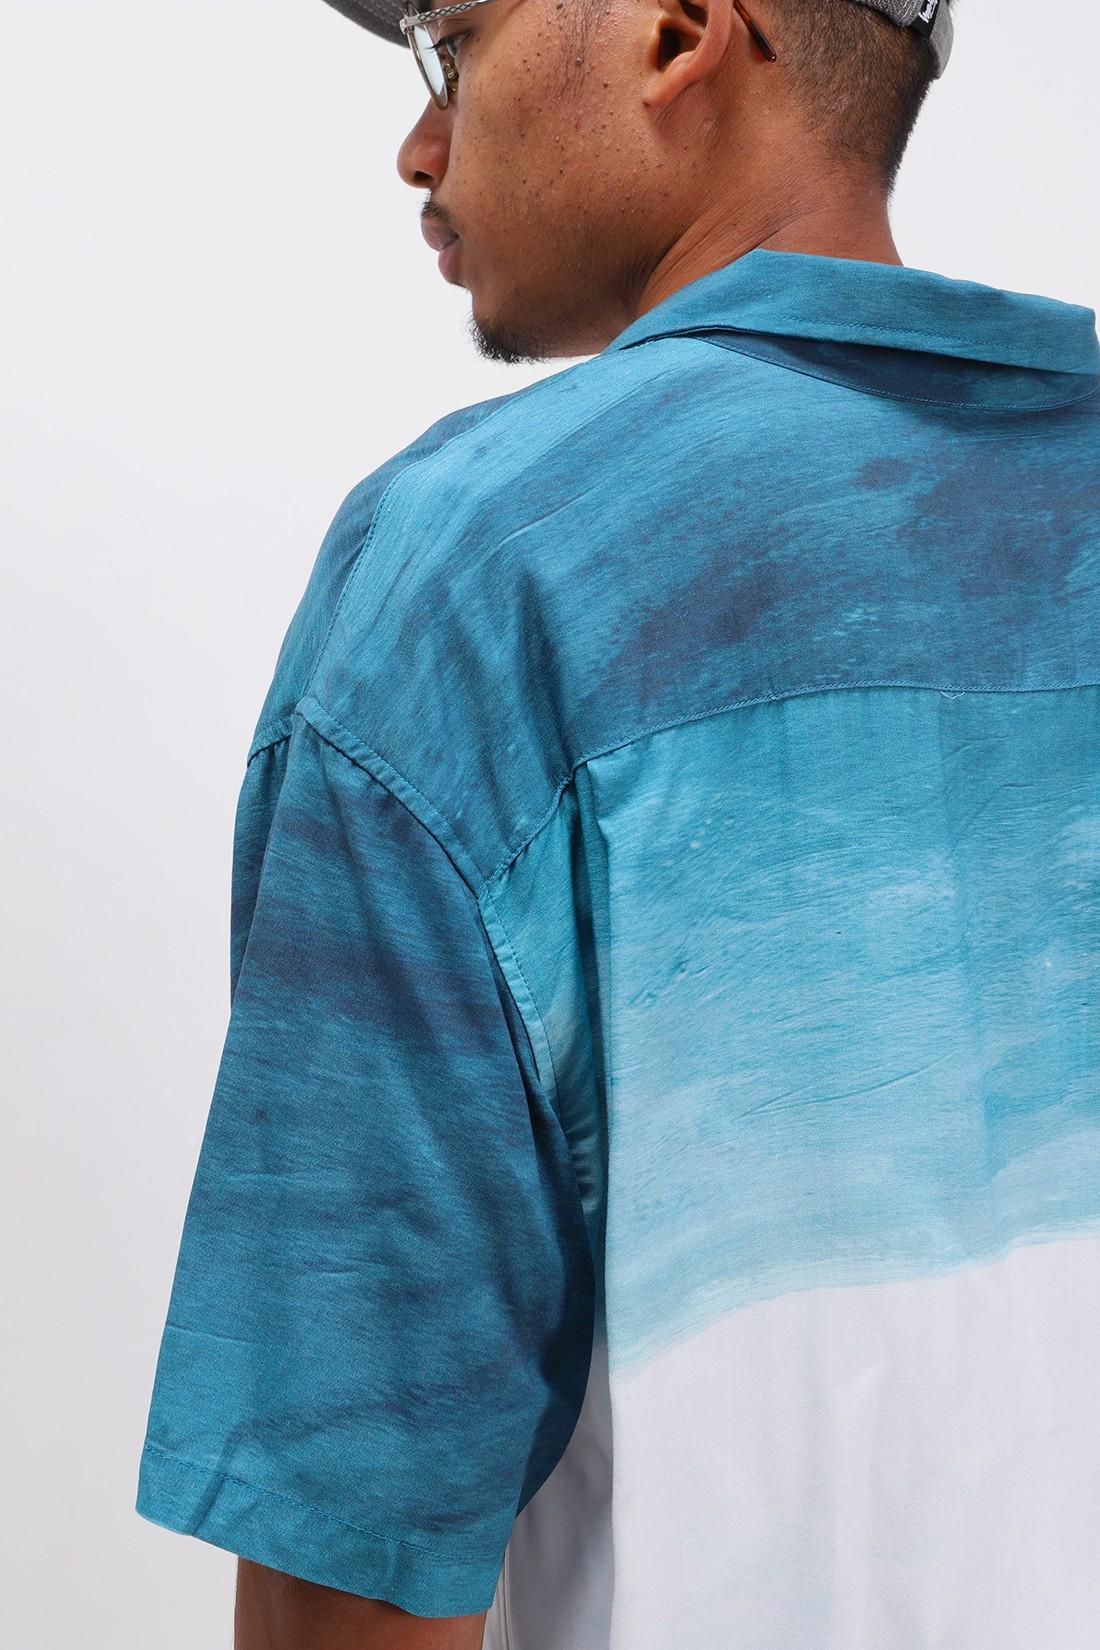 STUSSY / Dice painting shirt Blue